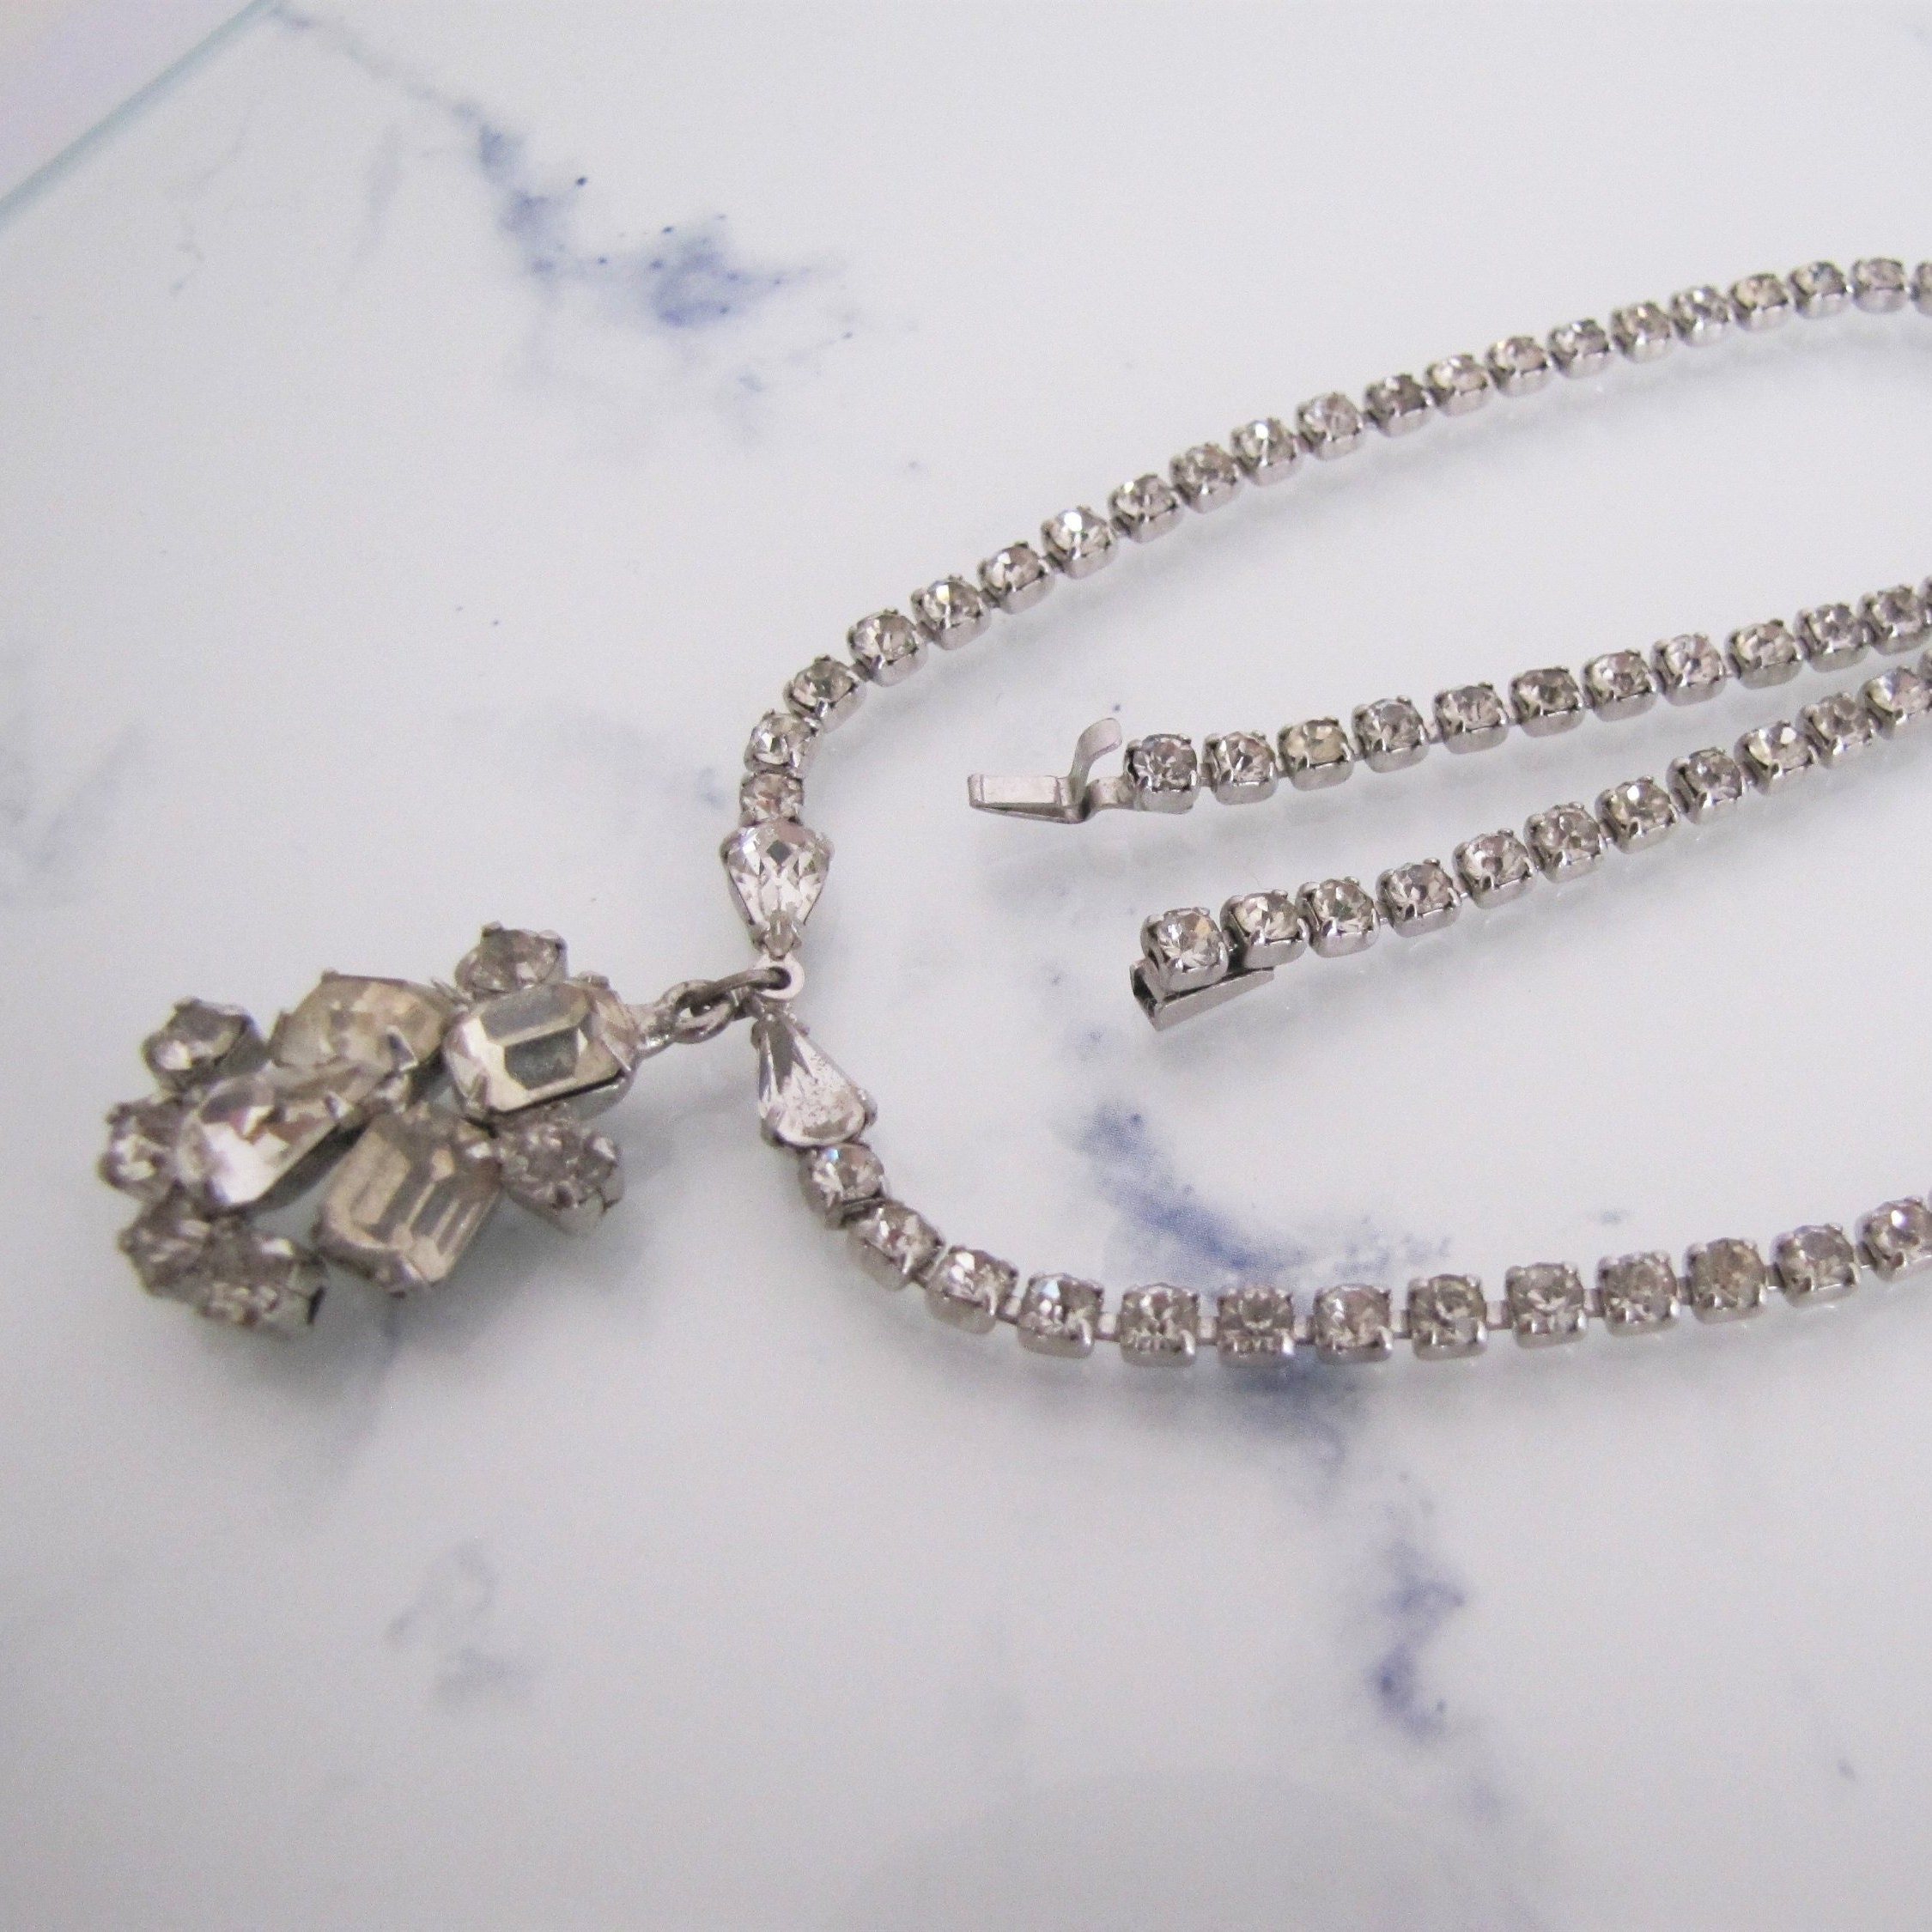 Bling Wrap Necklace Drop Rhinestone Crystal Choker Long Silver Diamante Chain